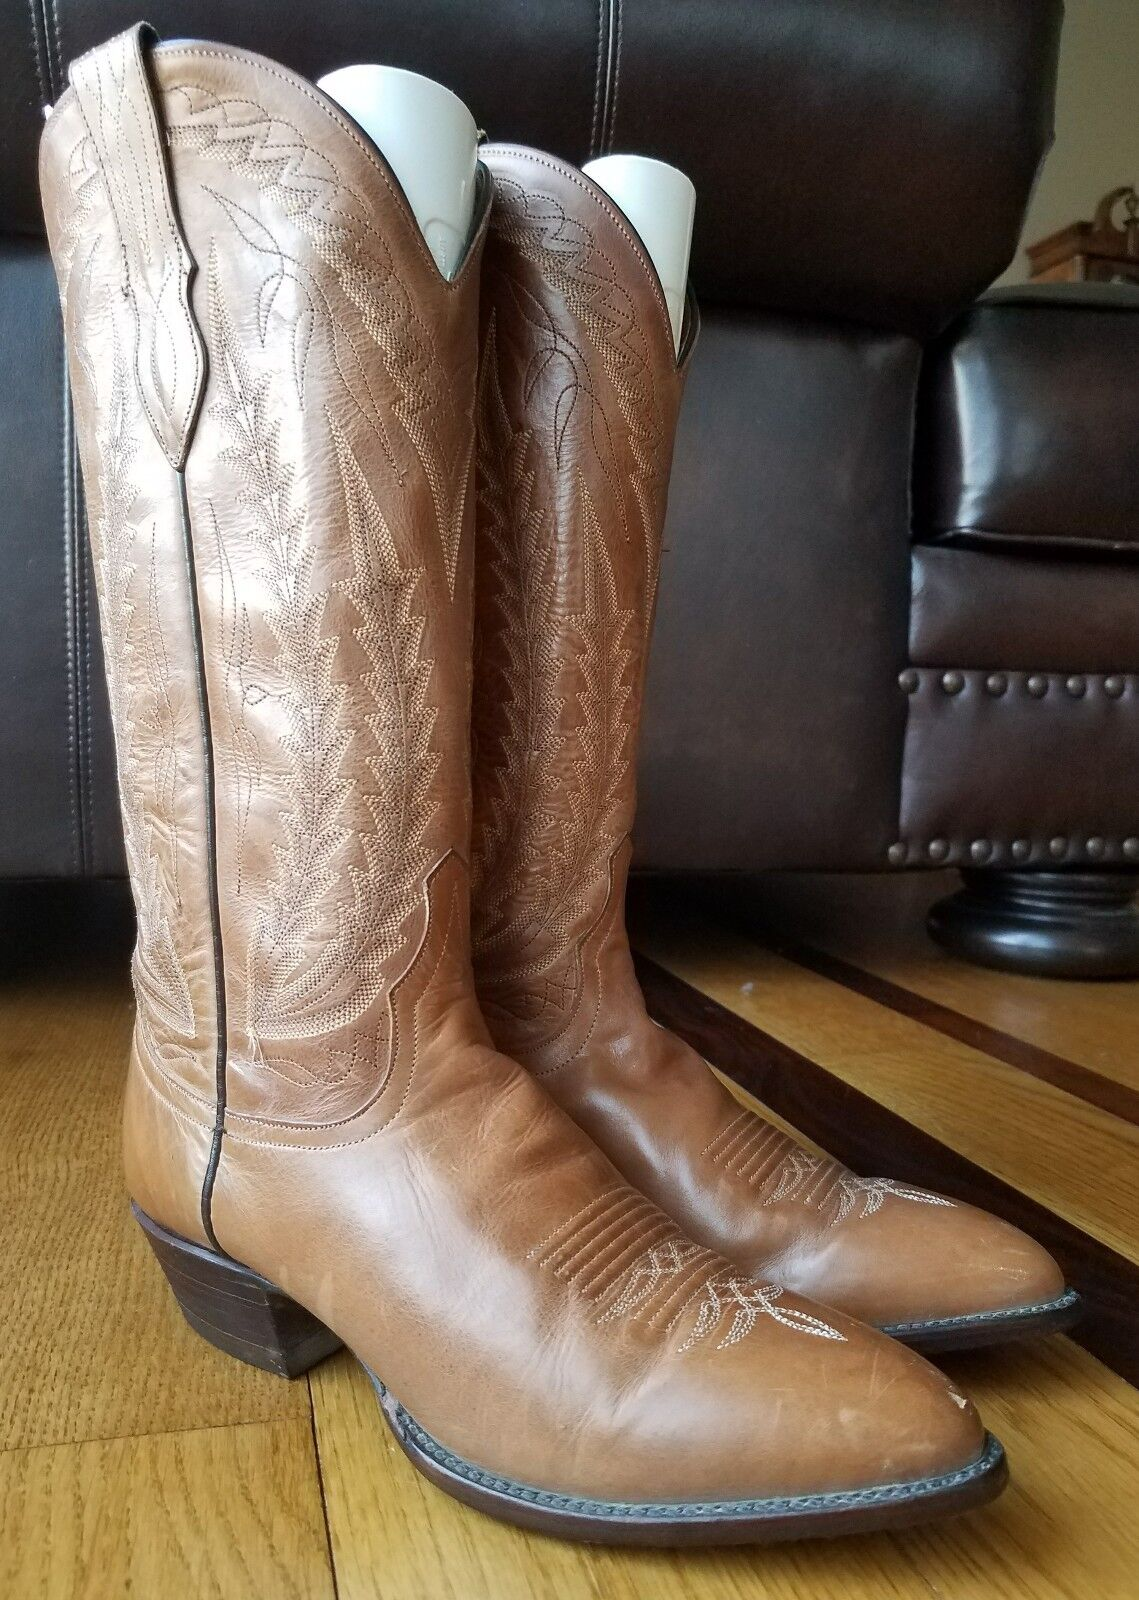 Larry  Mahan Woman's Cognac Leather Western Cowboy Boots 7.5 M USA Texas  a lot of surprises